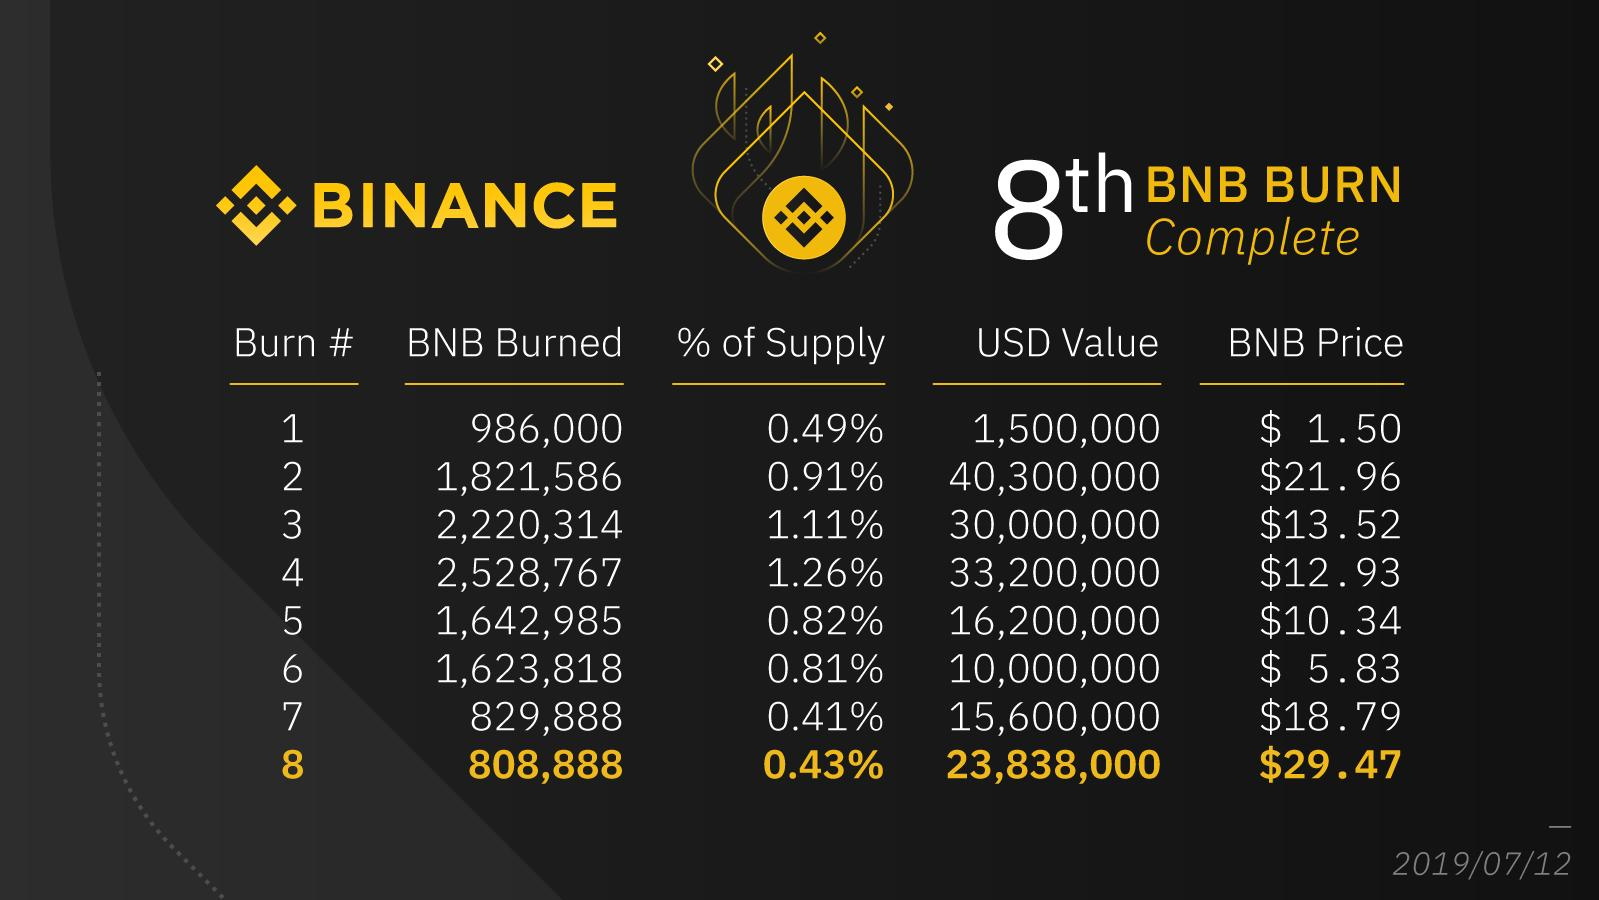 BinanceのBNBバーンの最新状況、これからのBNB需要は?